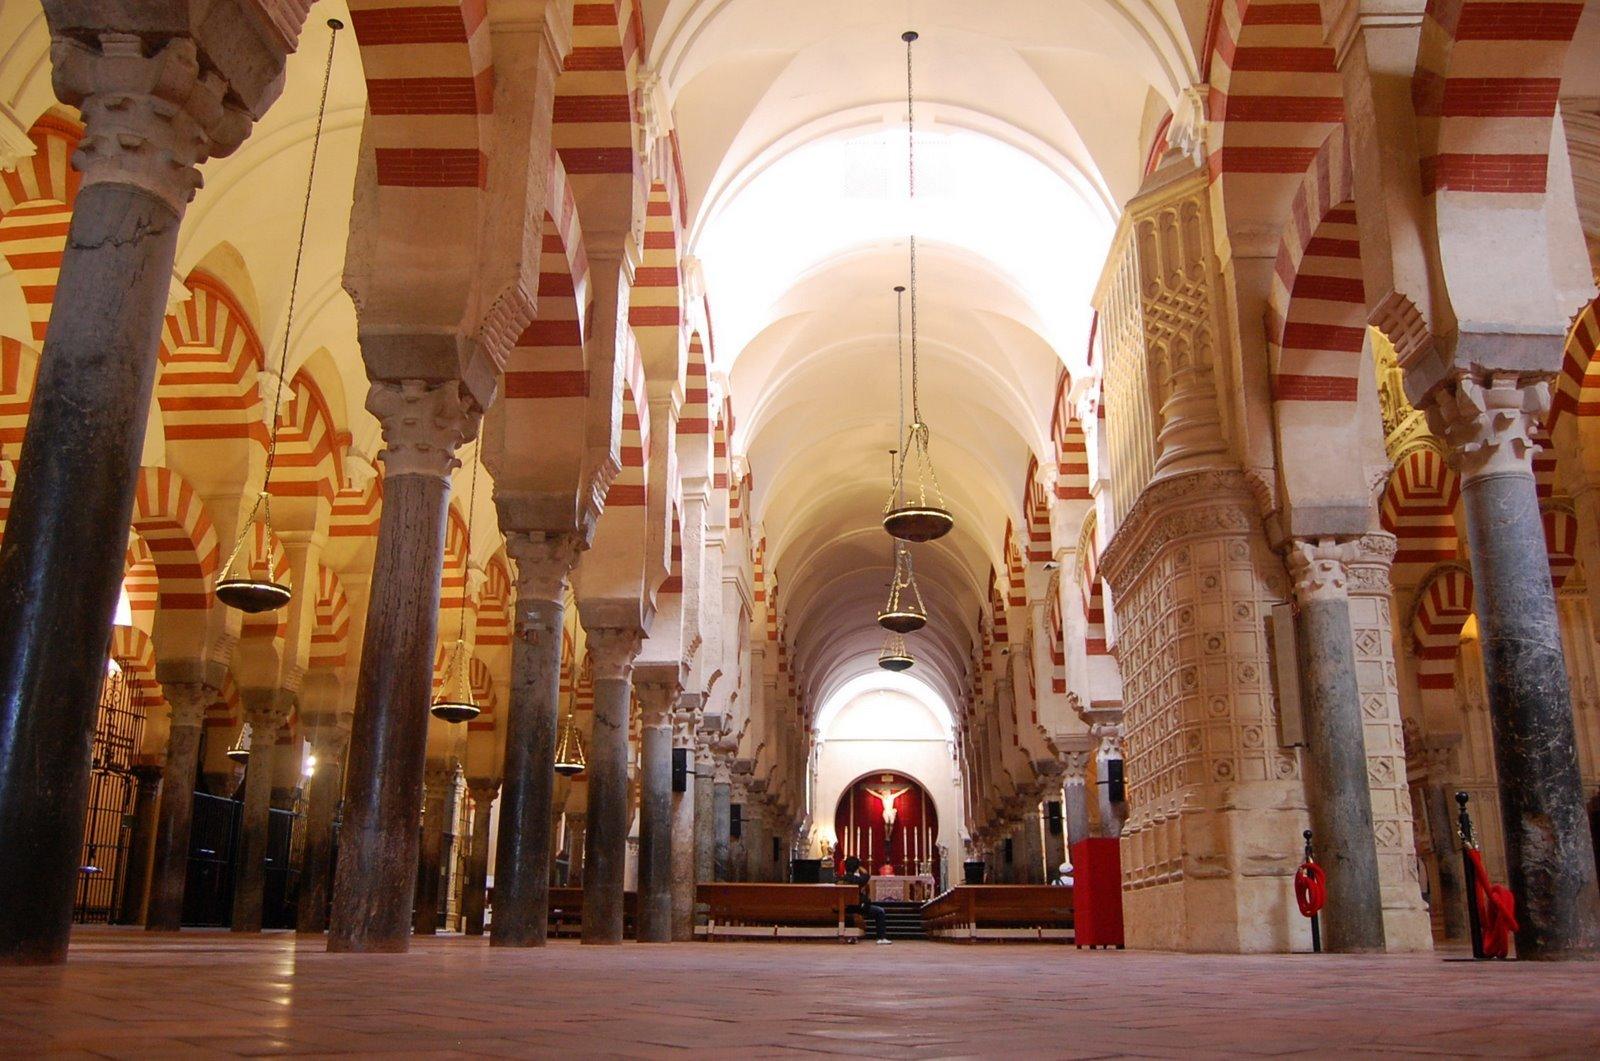 Mezquita Picture: Córdoba, Spain -- Christian Cathedral